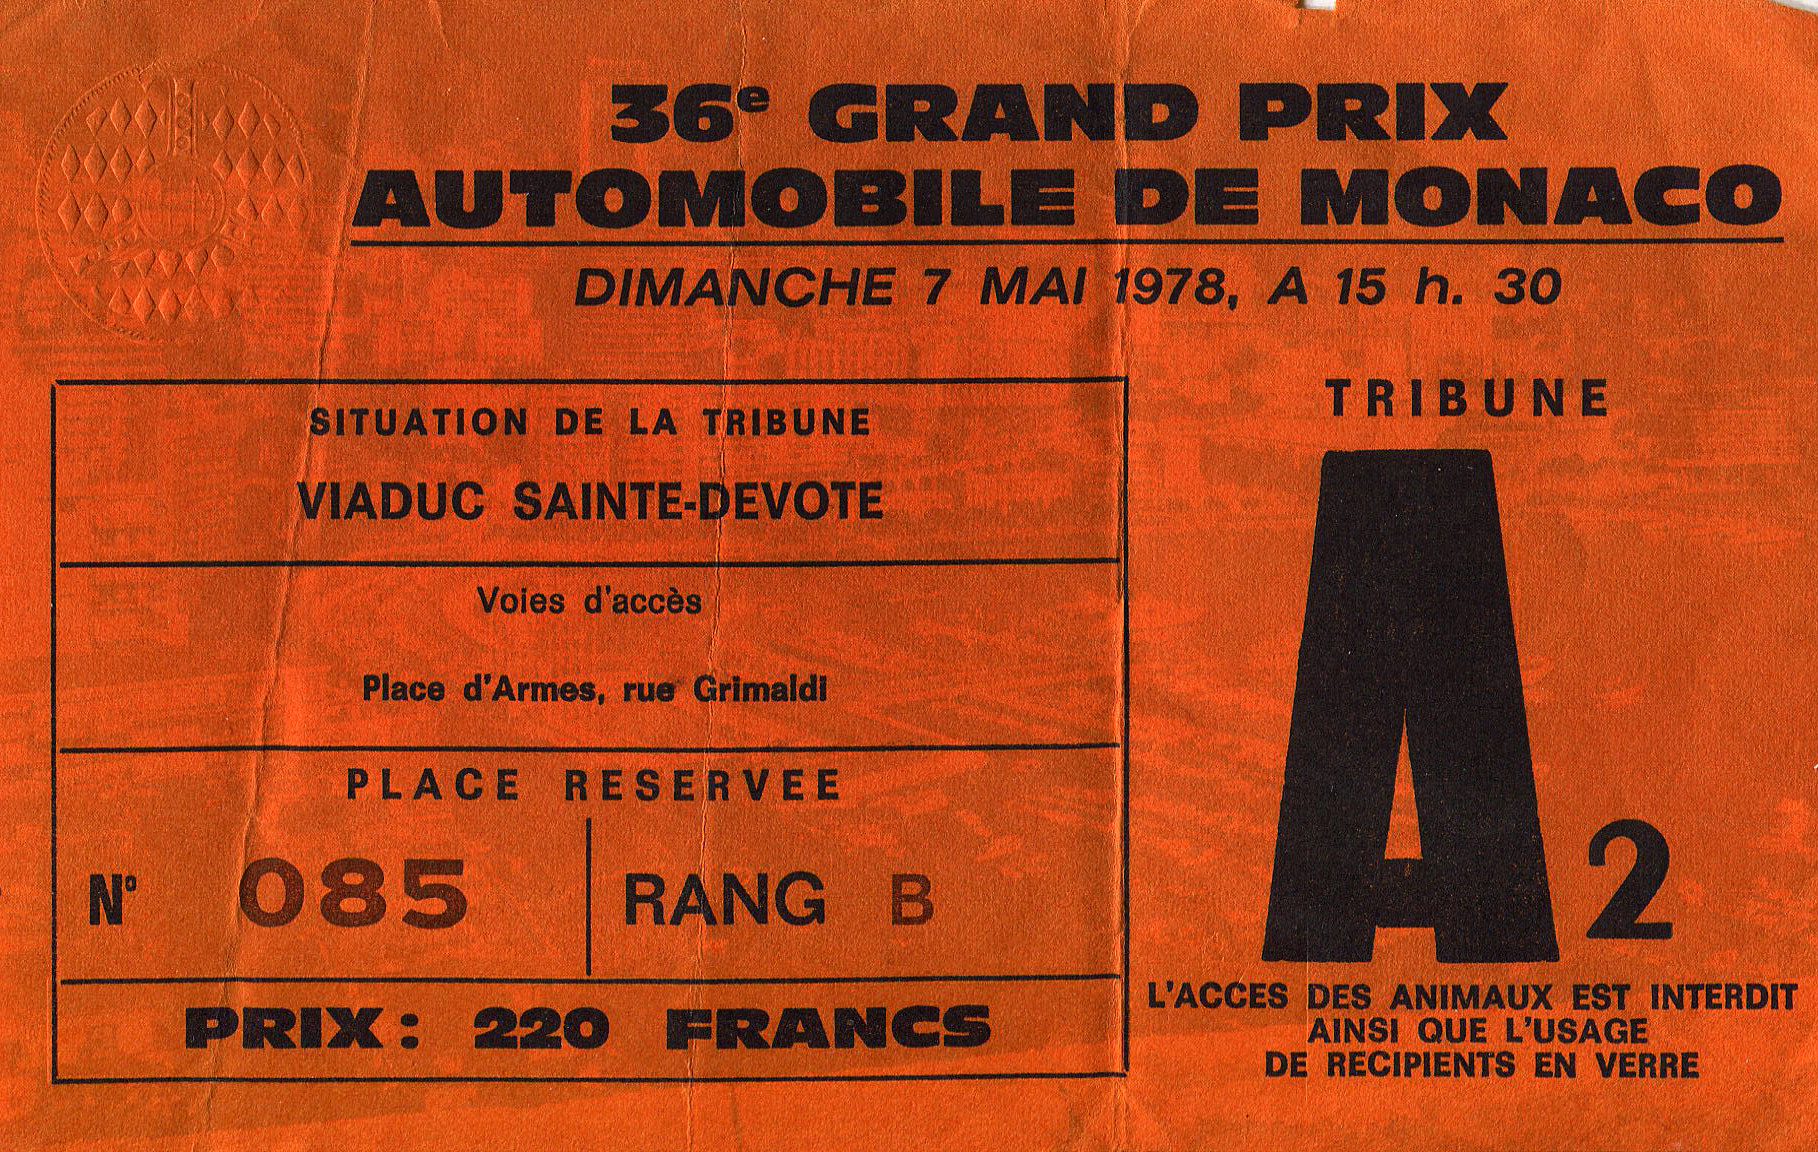 Monaco GP ticket